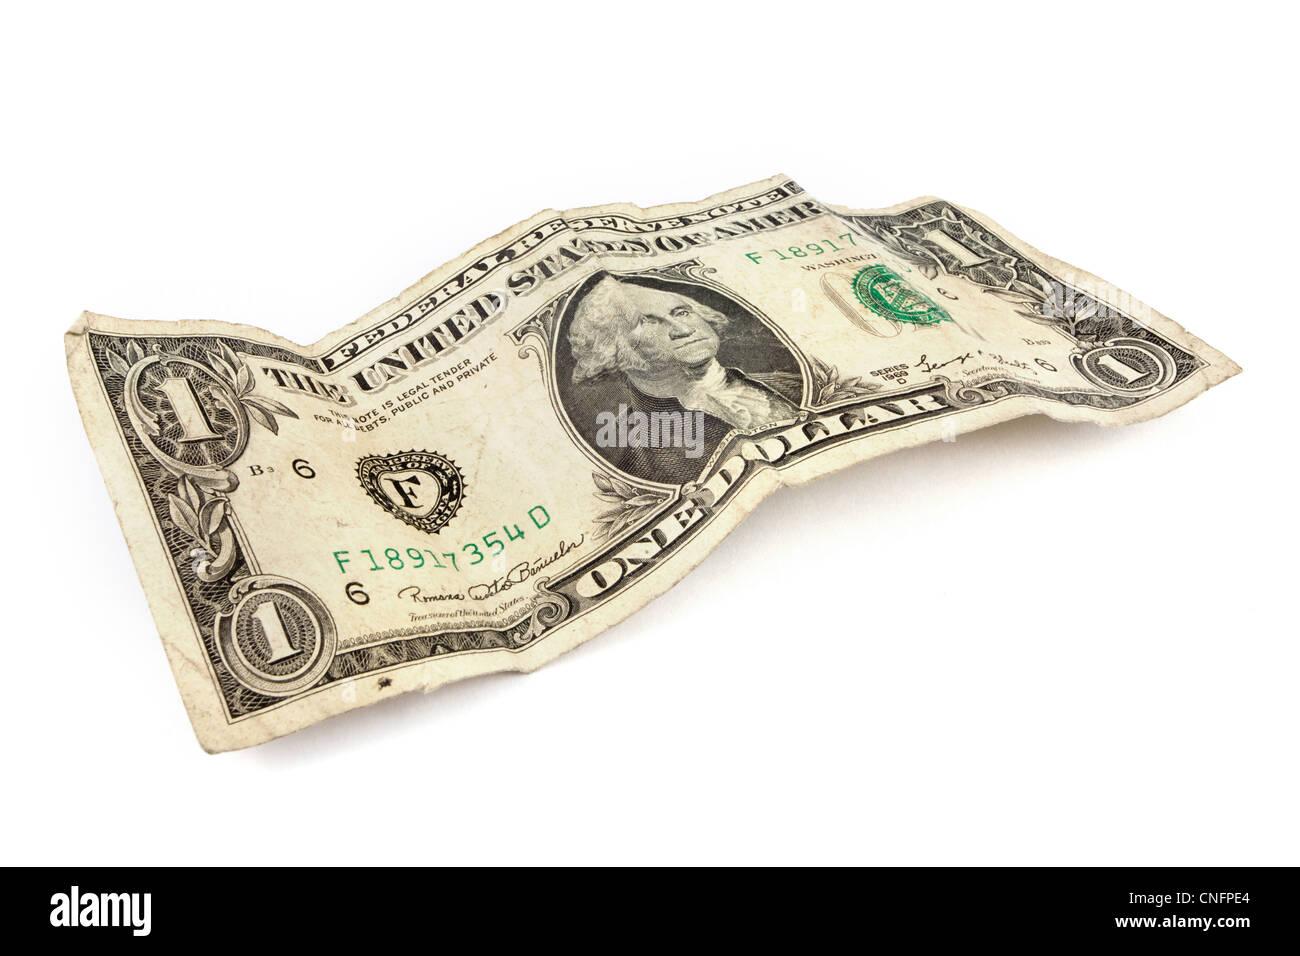 Vieux dollar bill sur un fond blanc Photo Stock